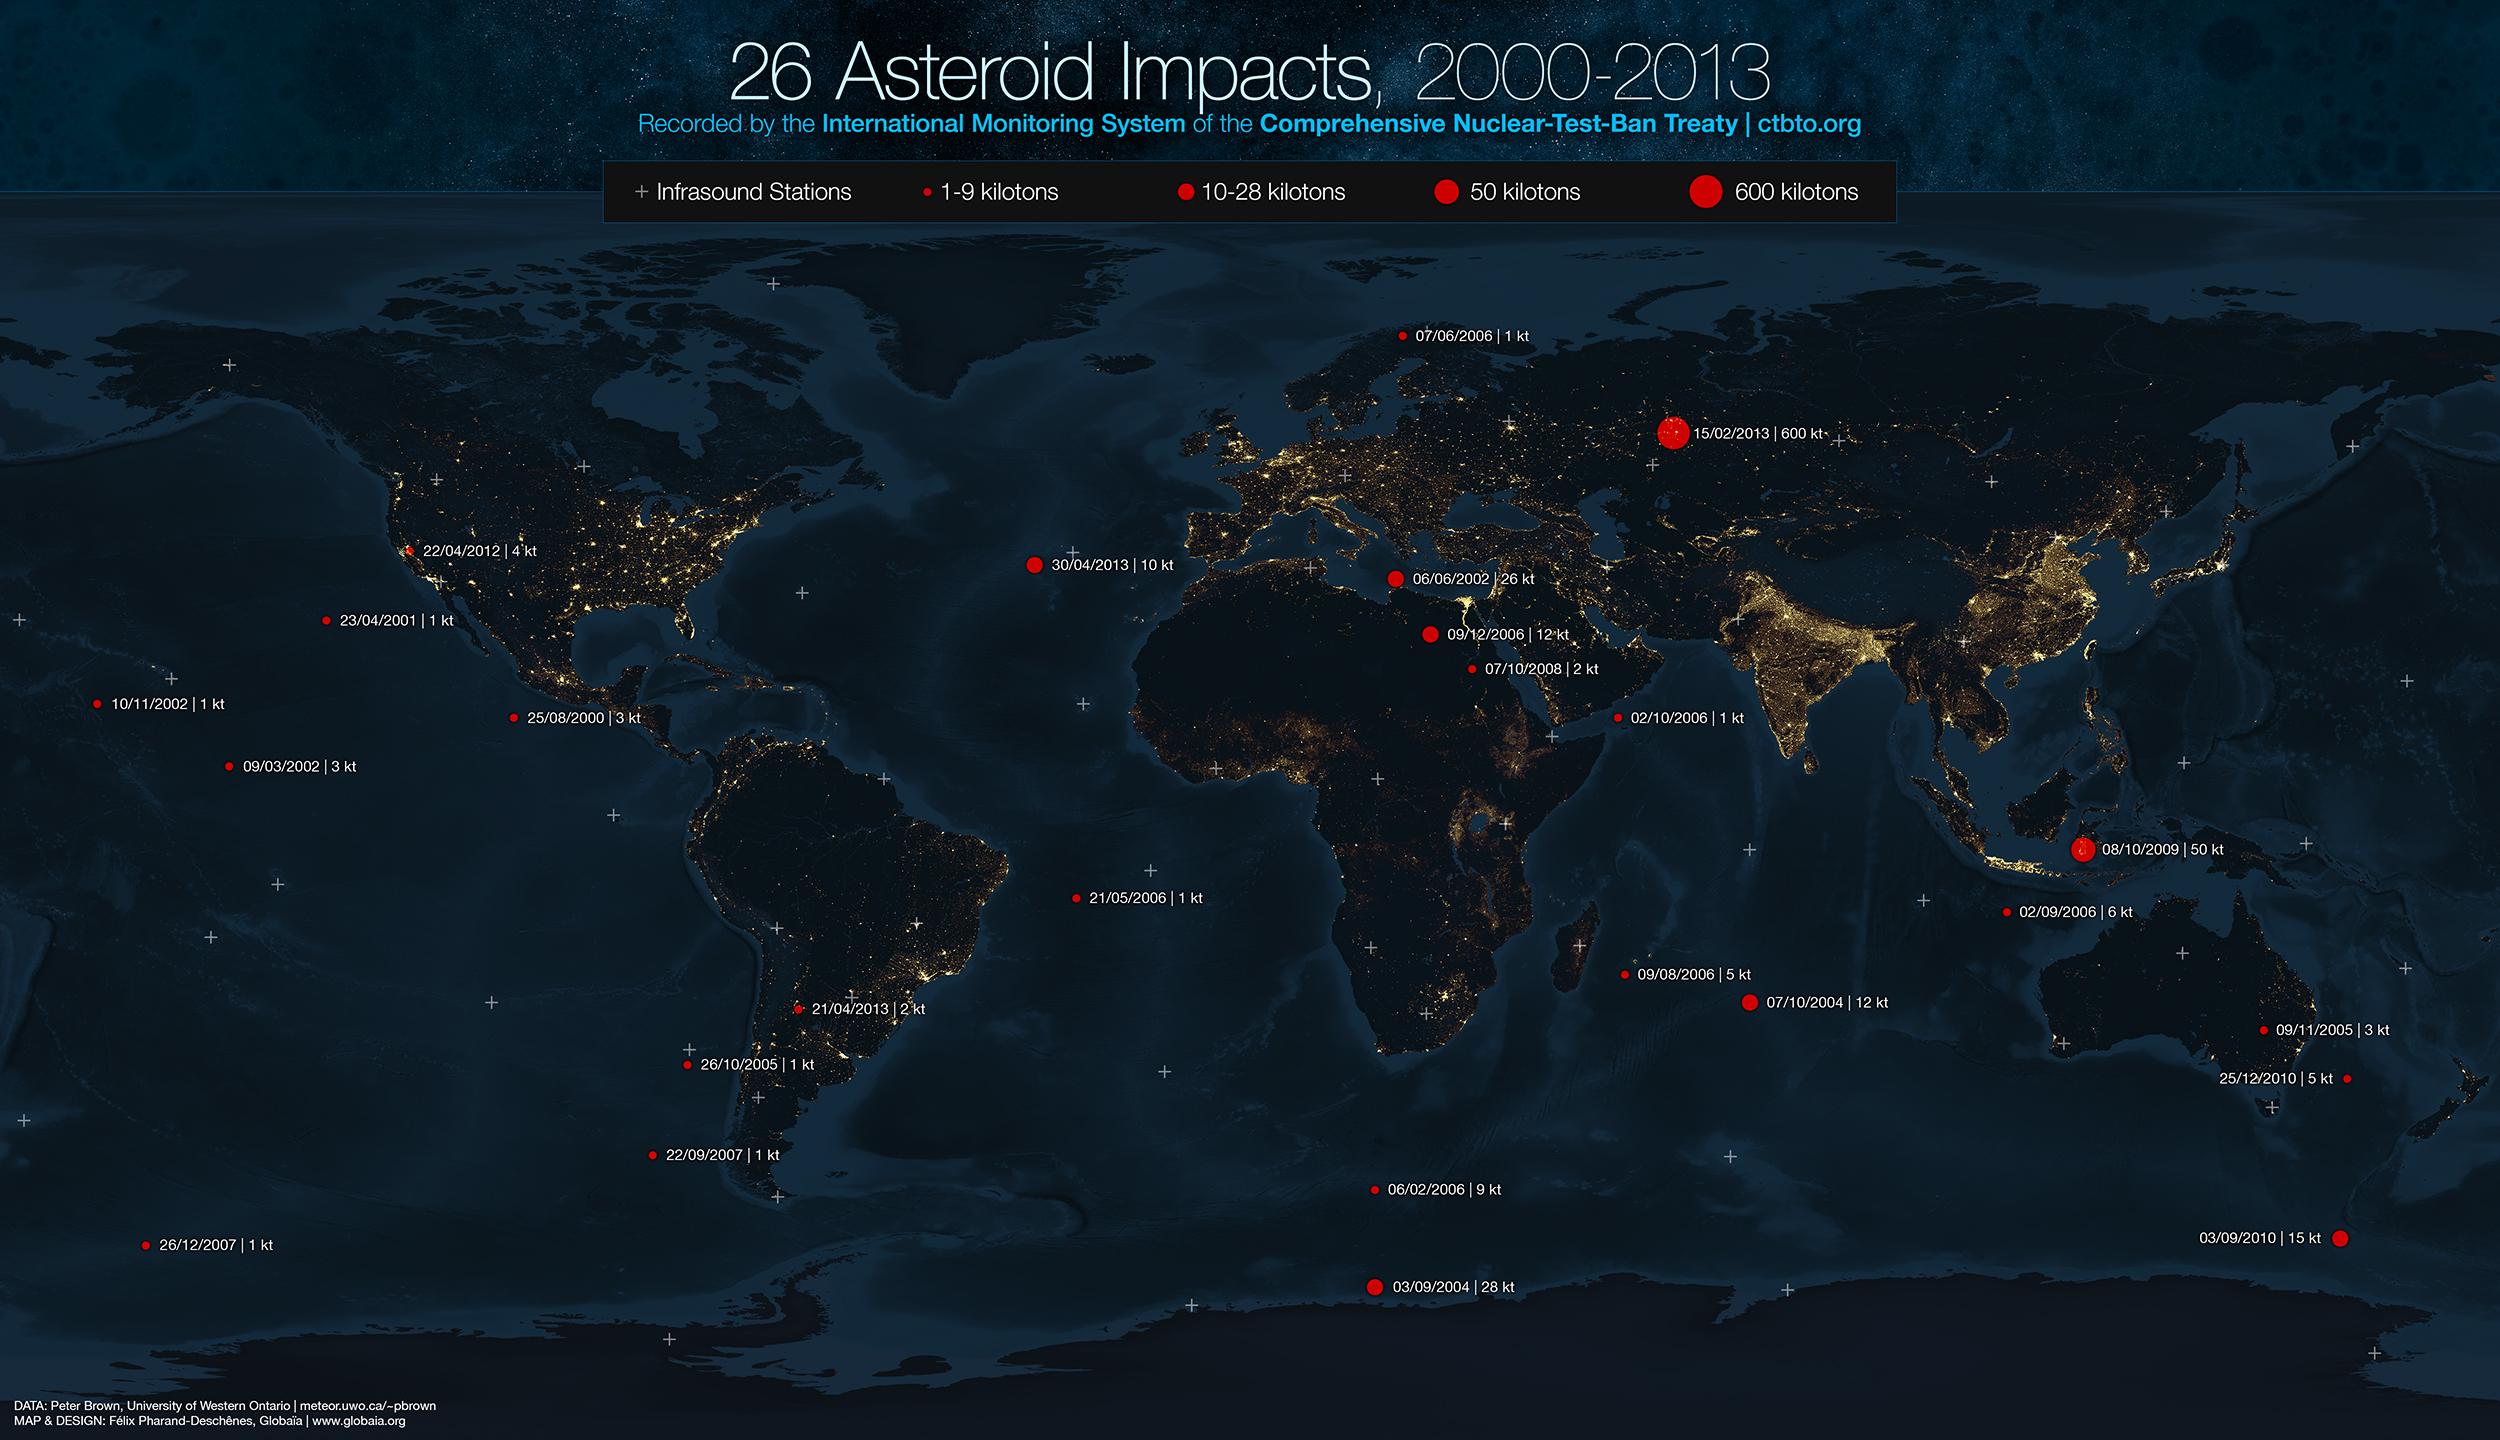 Recent meteor impacts